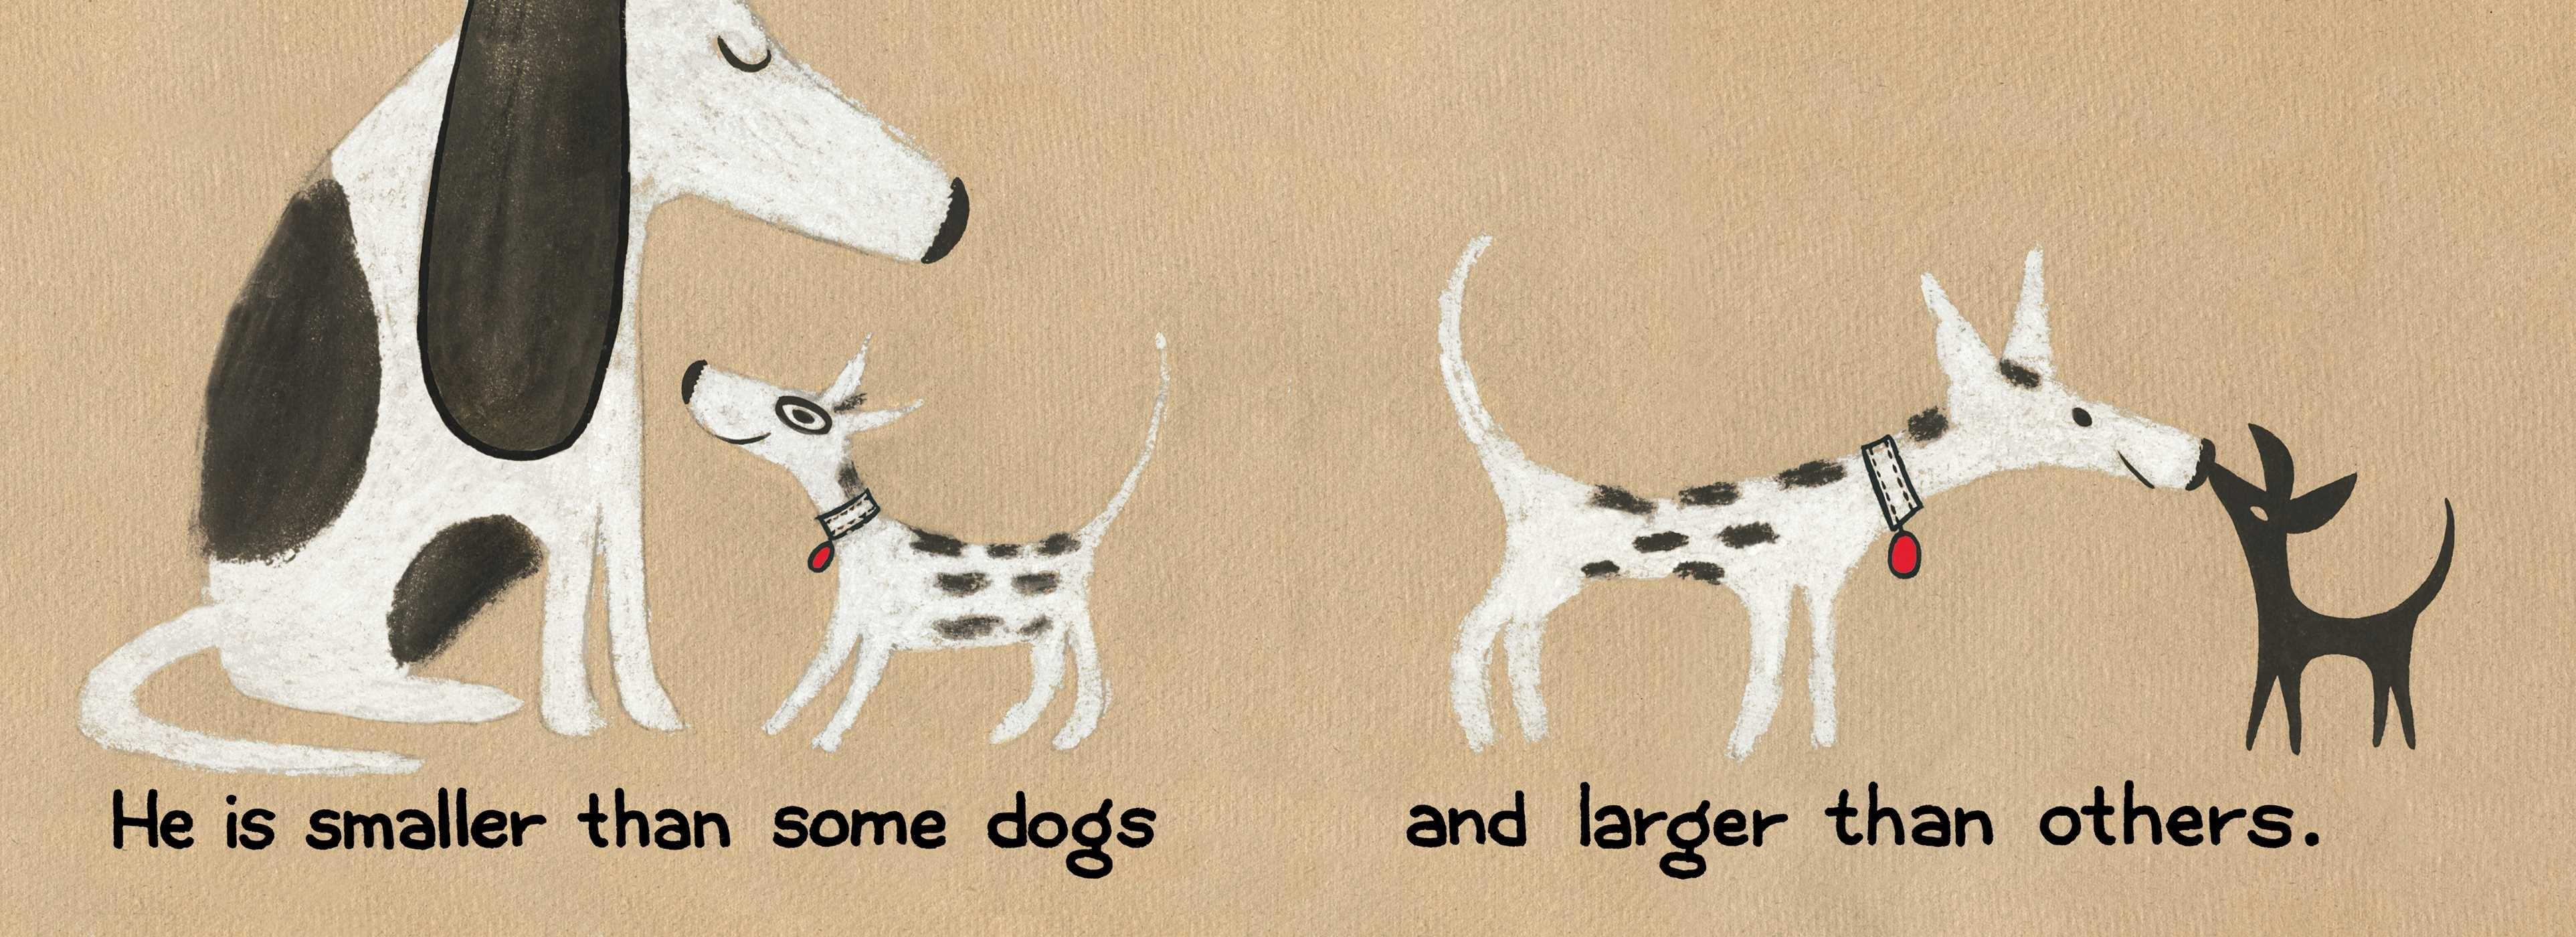 My dog spot 9781481469074.in04